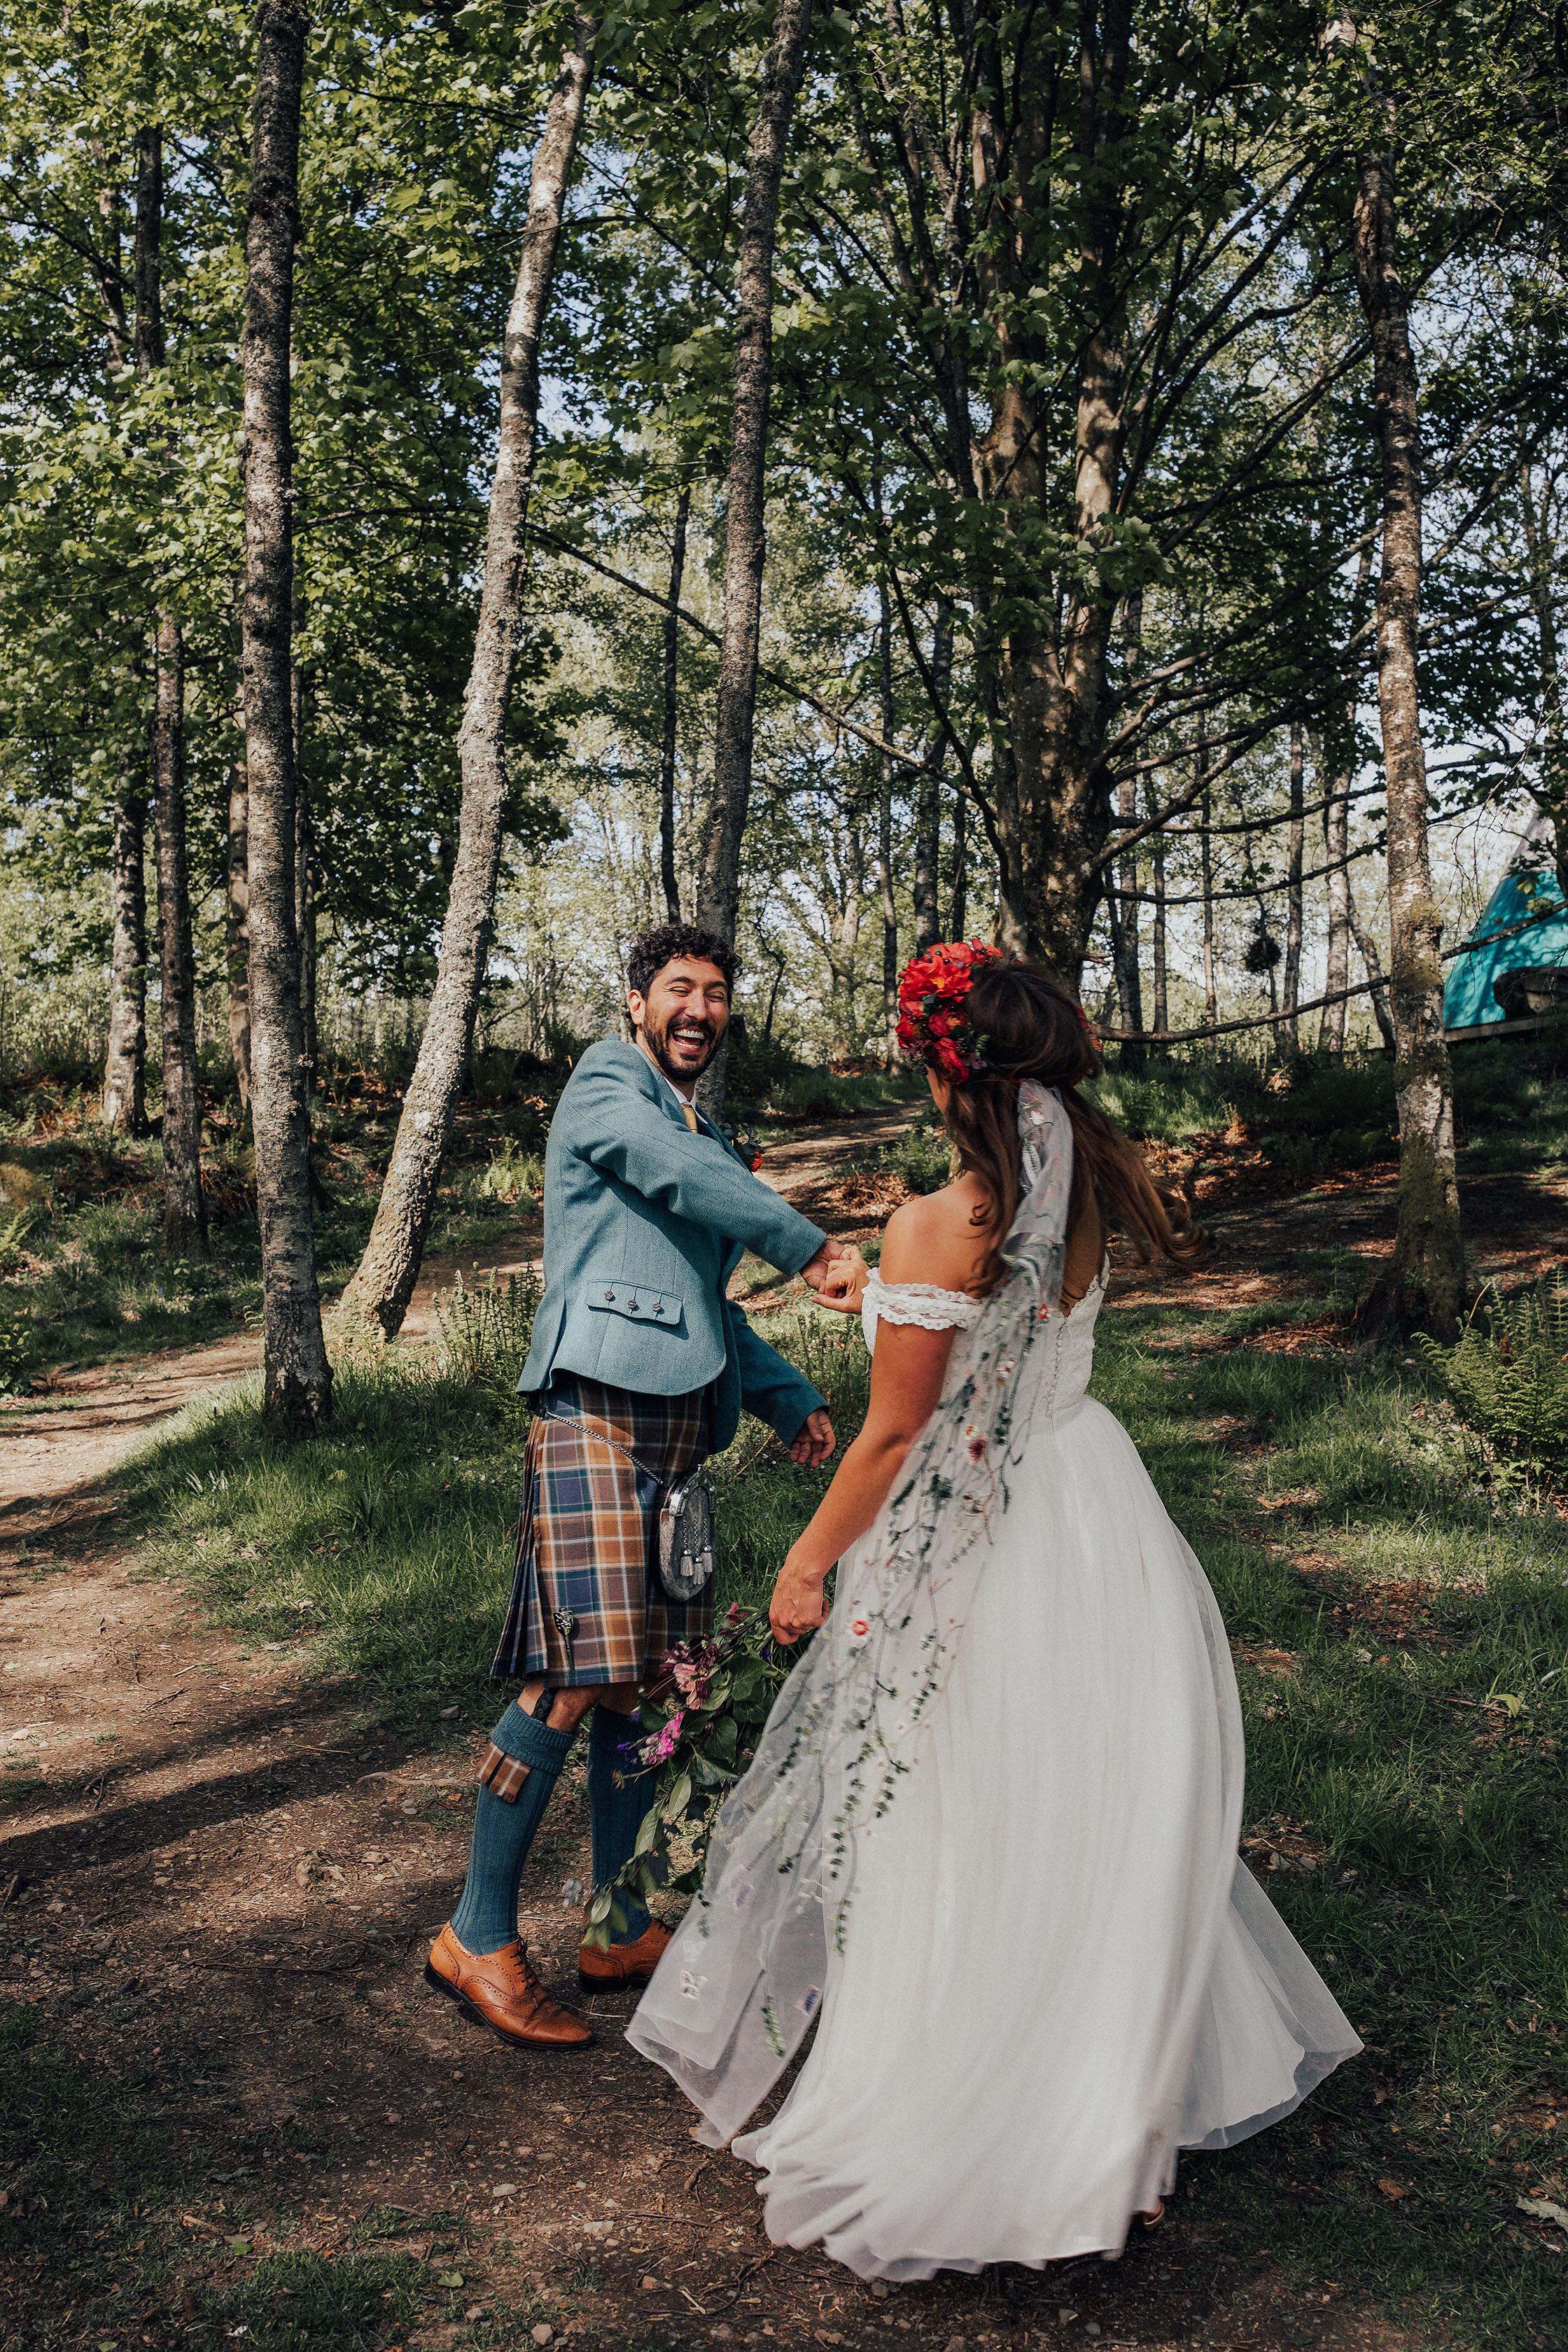 COMRIE_CROFT_WEDDINGS_PJ_PHILLIPS_PHOTOGRAPHY_100.jpg